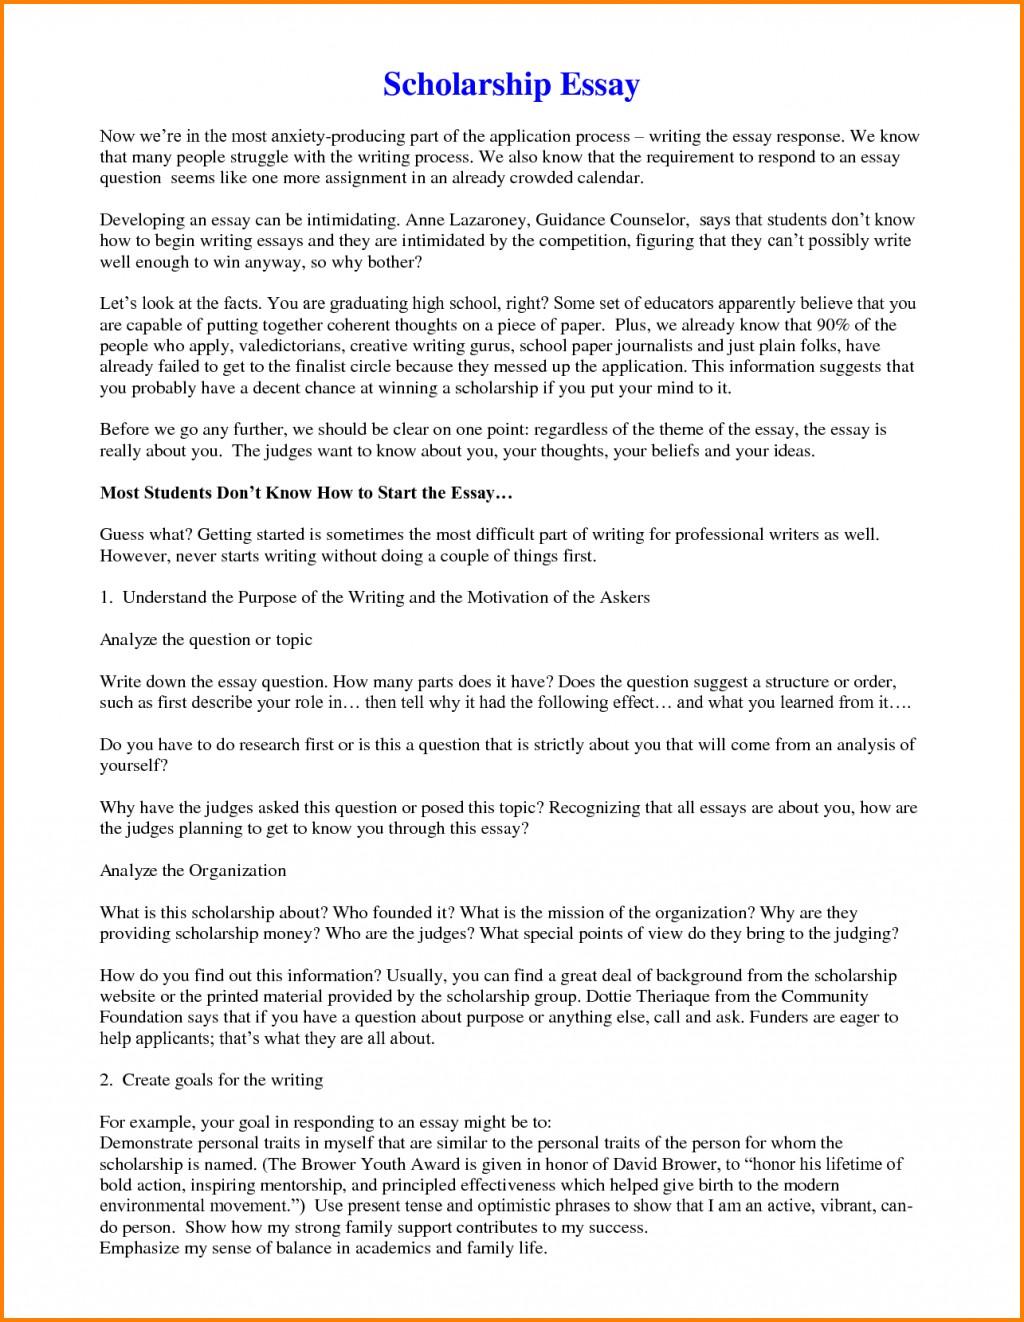 010 Example Scholarship Essays Of Essay Phenomenal Sample For Masters 500 Words Nursing Large